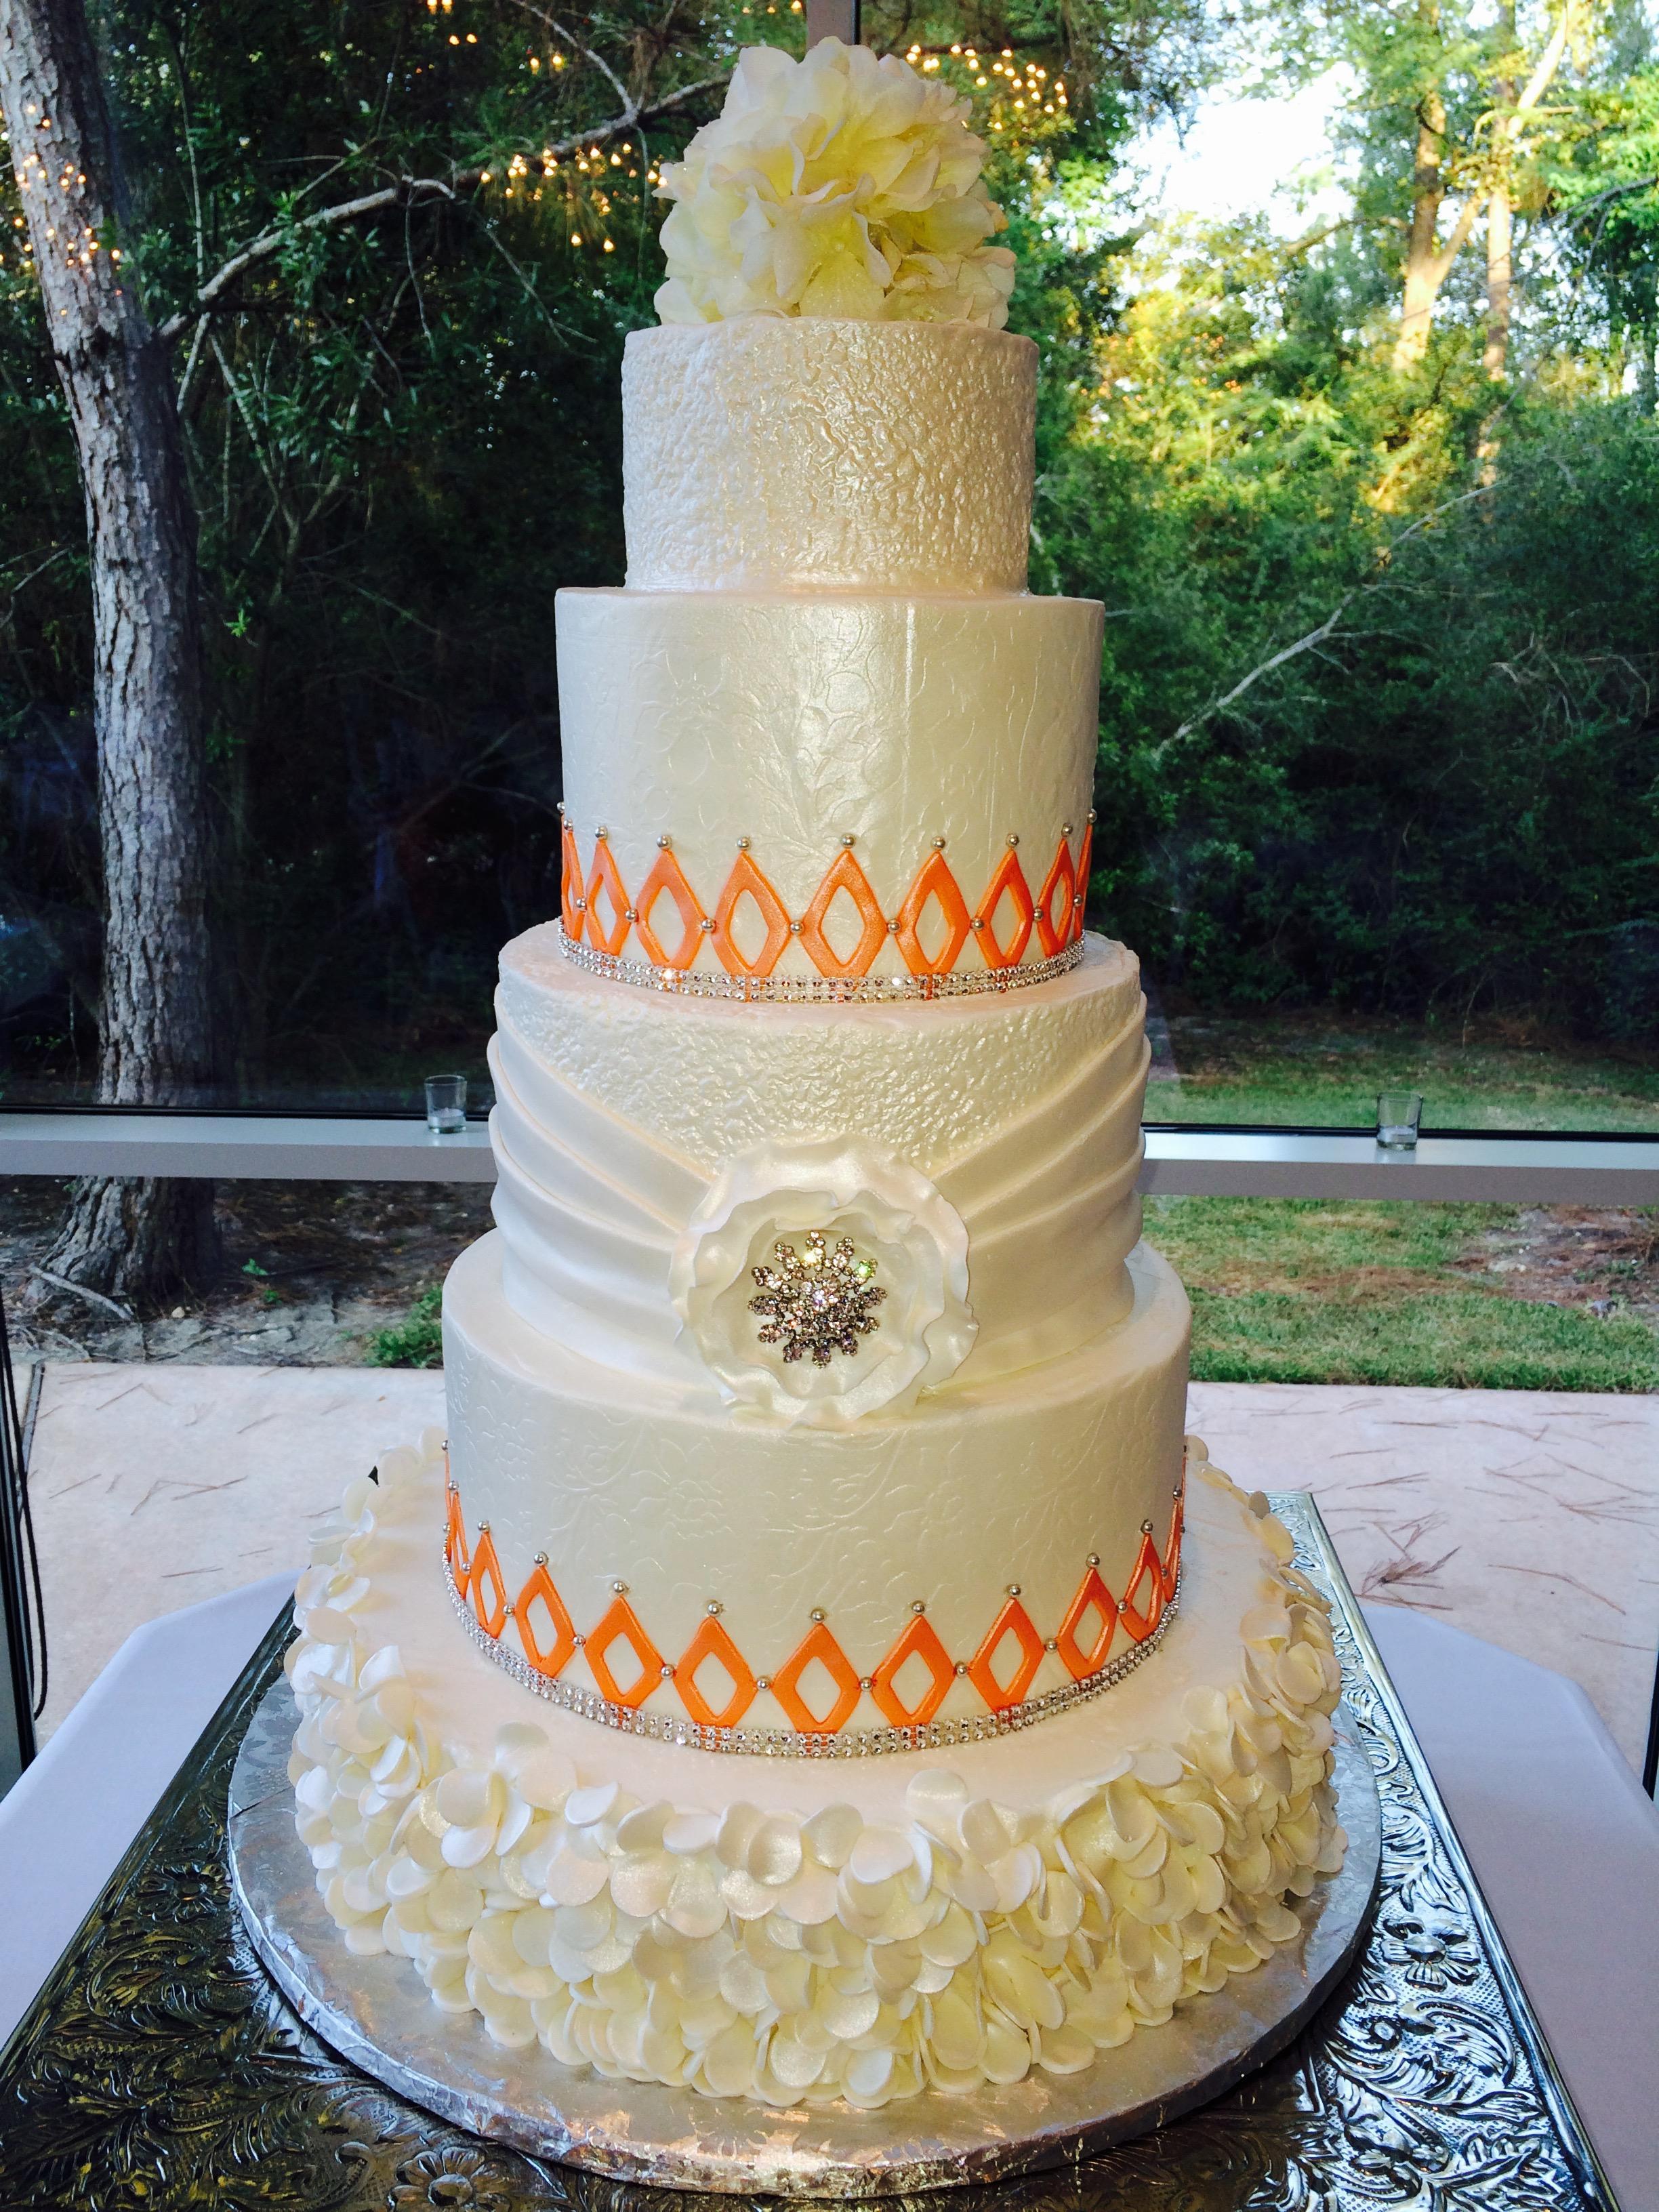 Wedding Cakes by Tammy Allen image 2